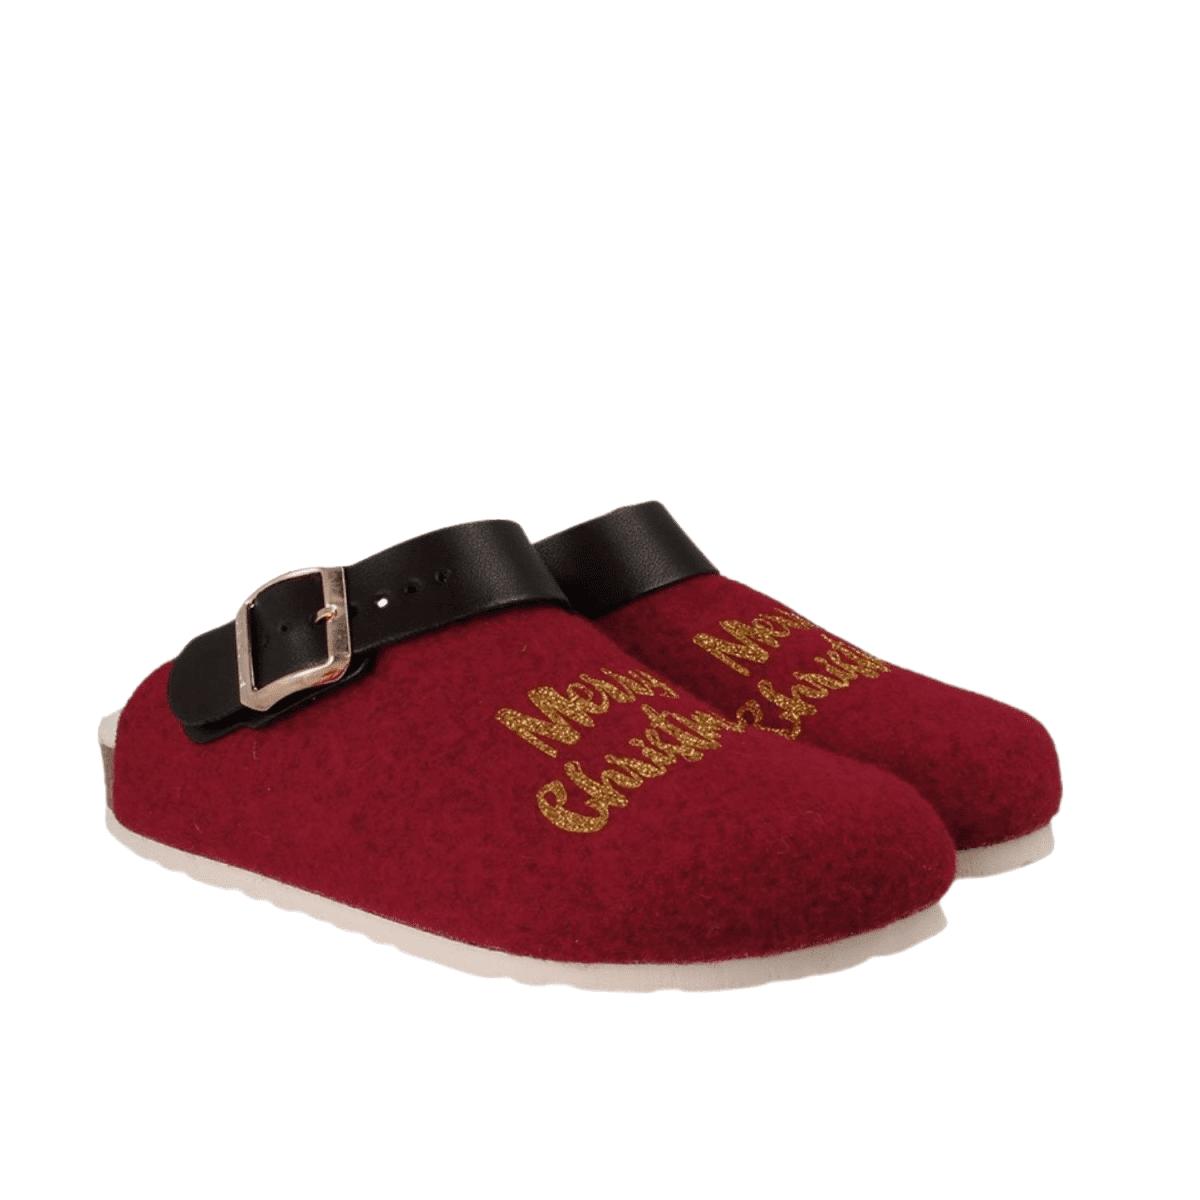 Genuins Pantofola Shetland Christmas - 40